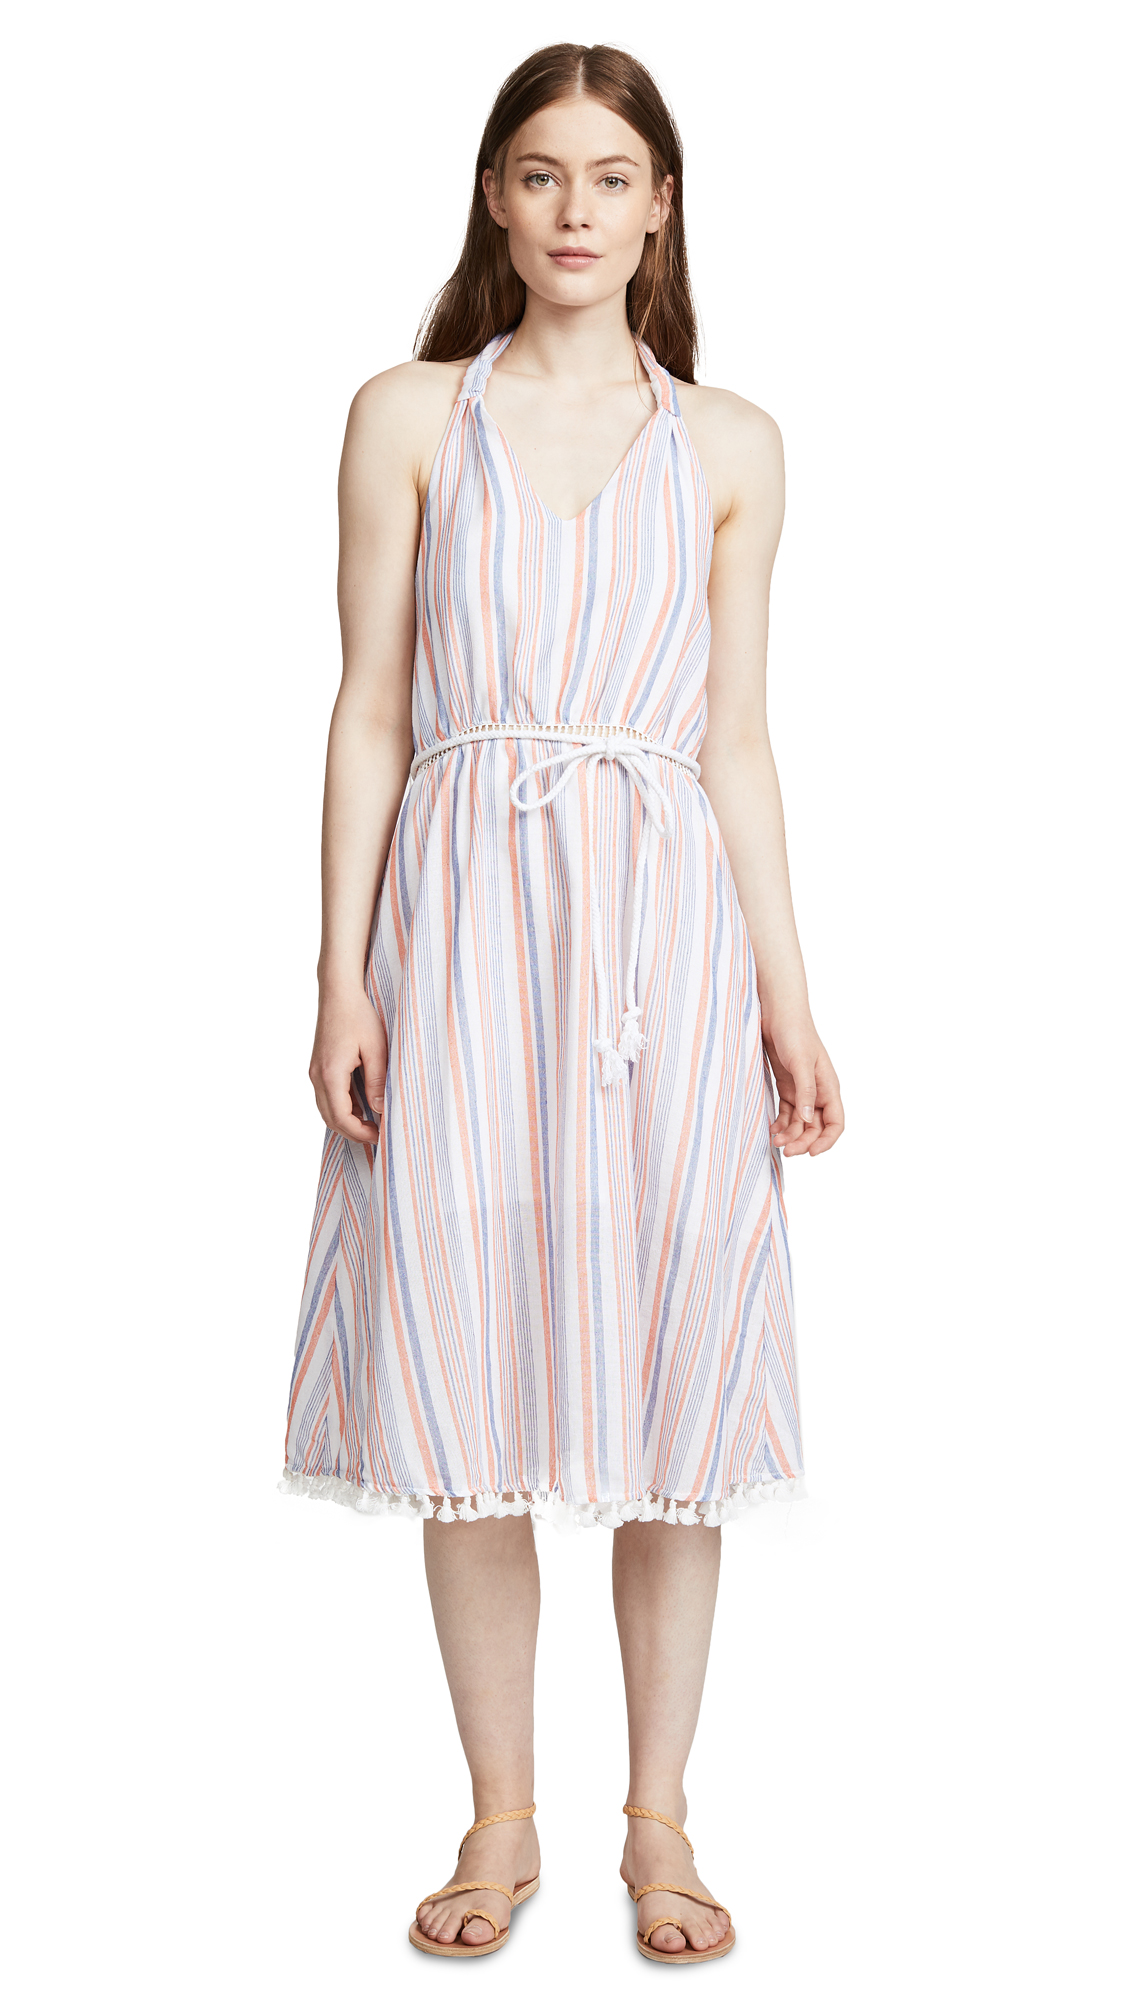 Moon River Striped Halter Dress - Coral Stripe